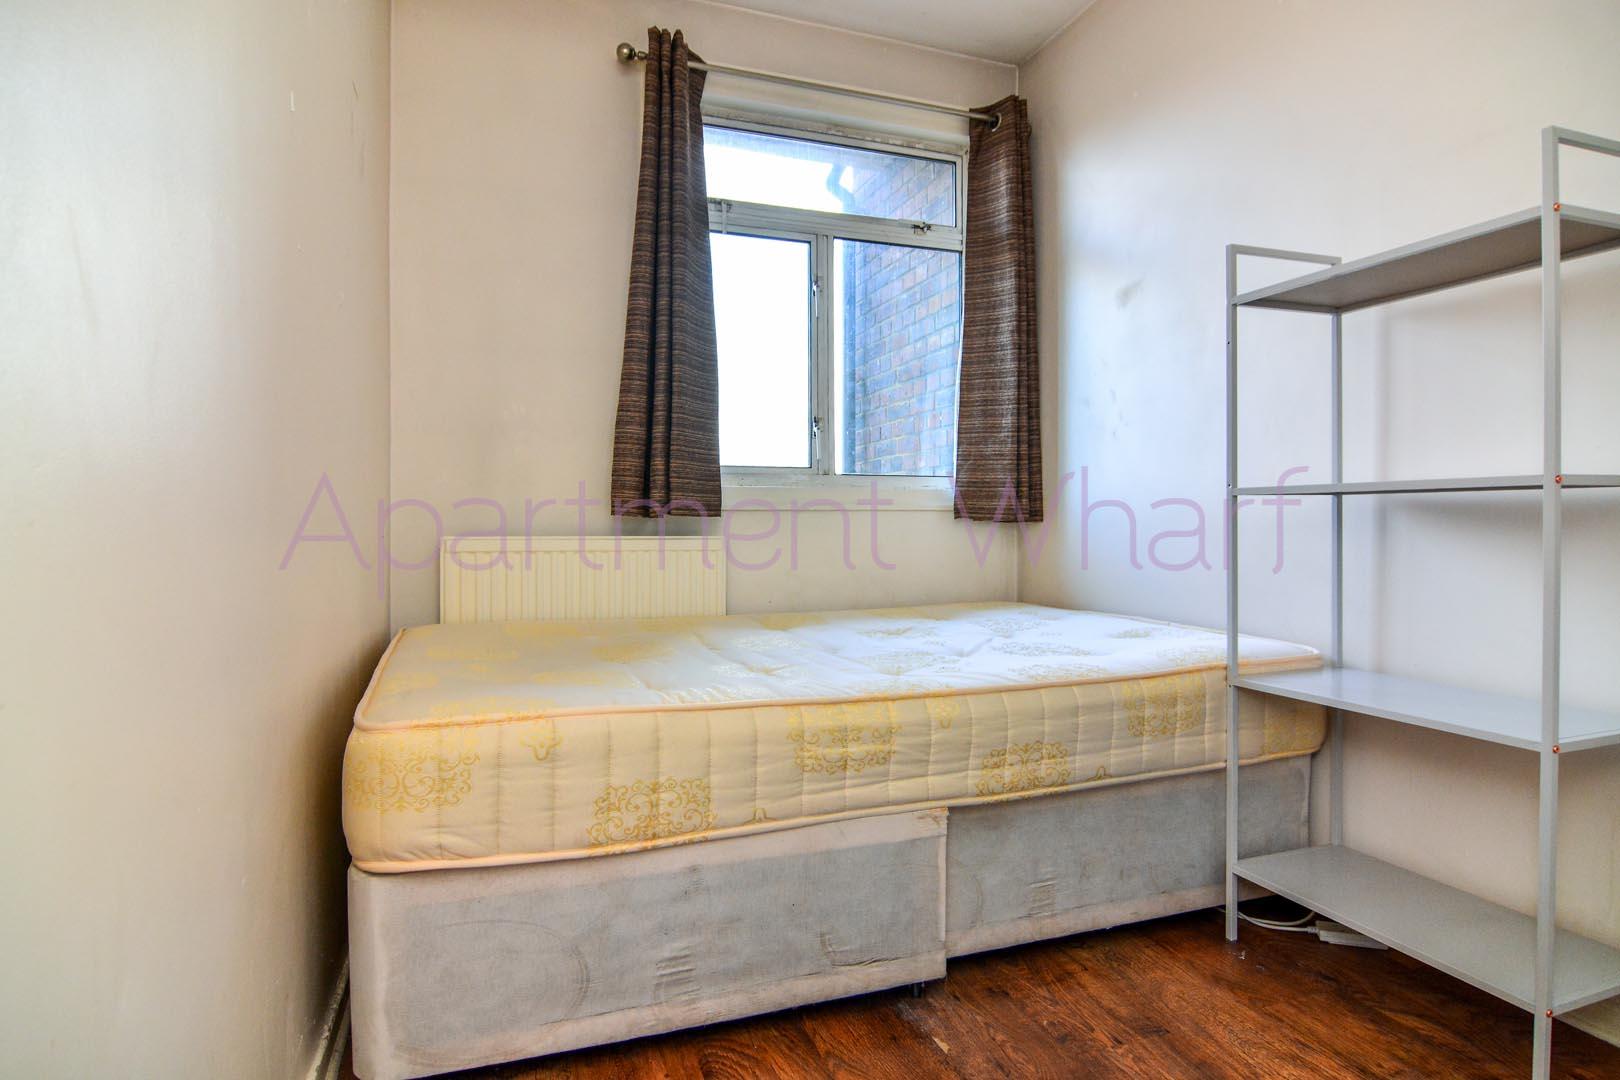 Accommodation Single Room Long Term London